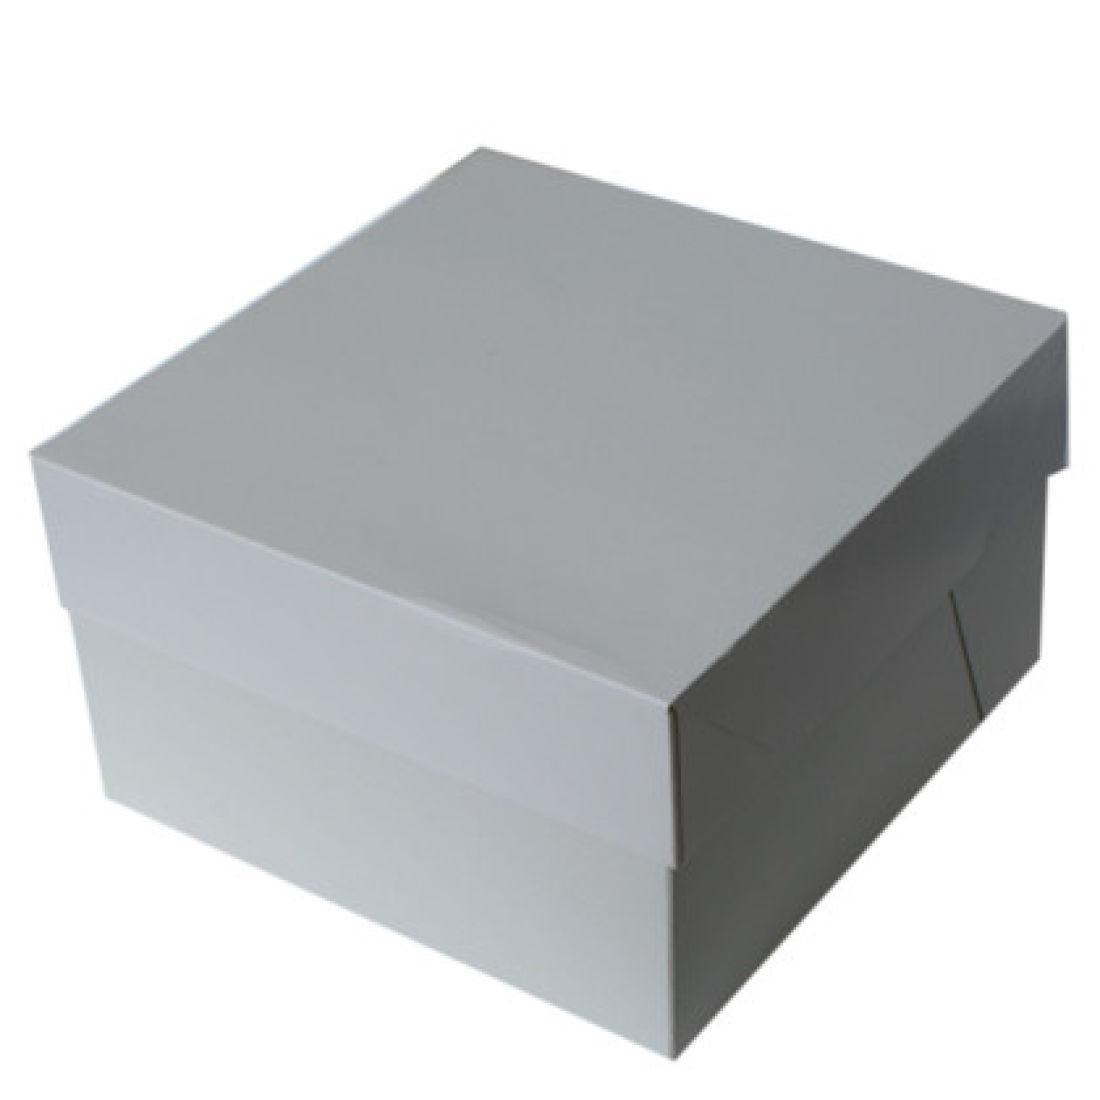 White Cake Box 10x10x6 Quot Squires Kitchen Shop